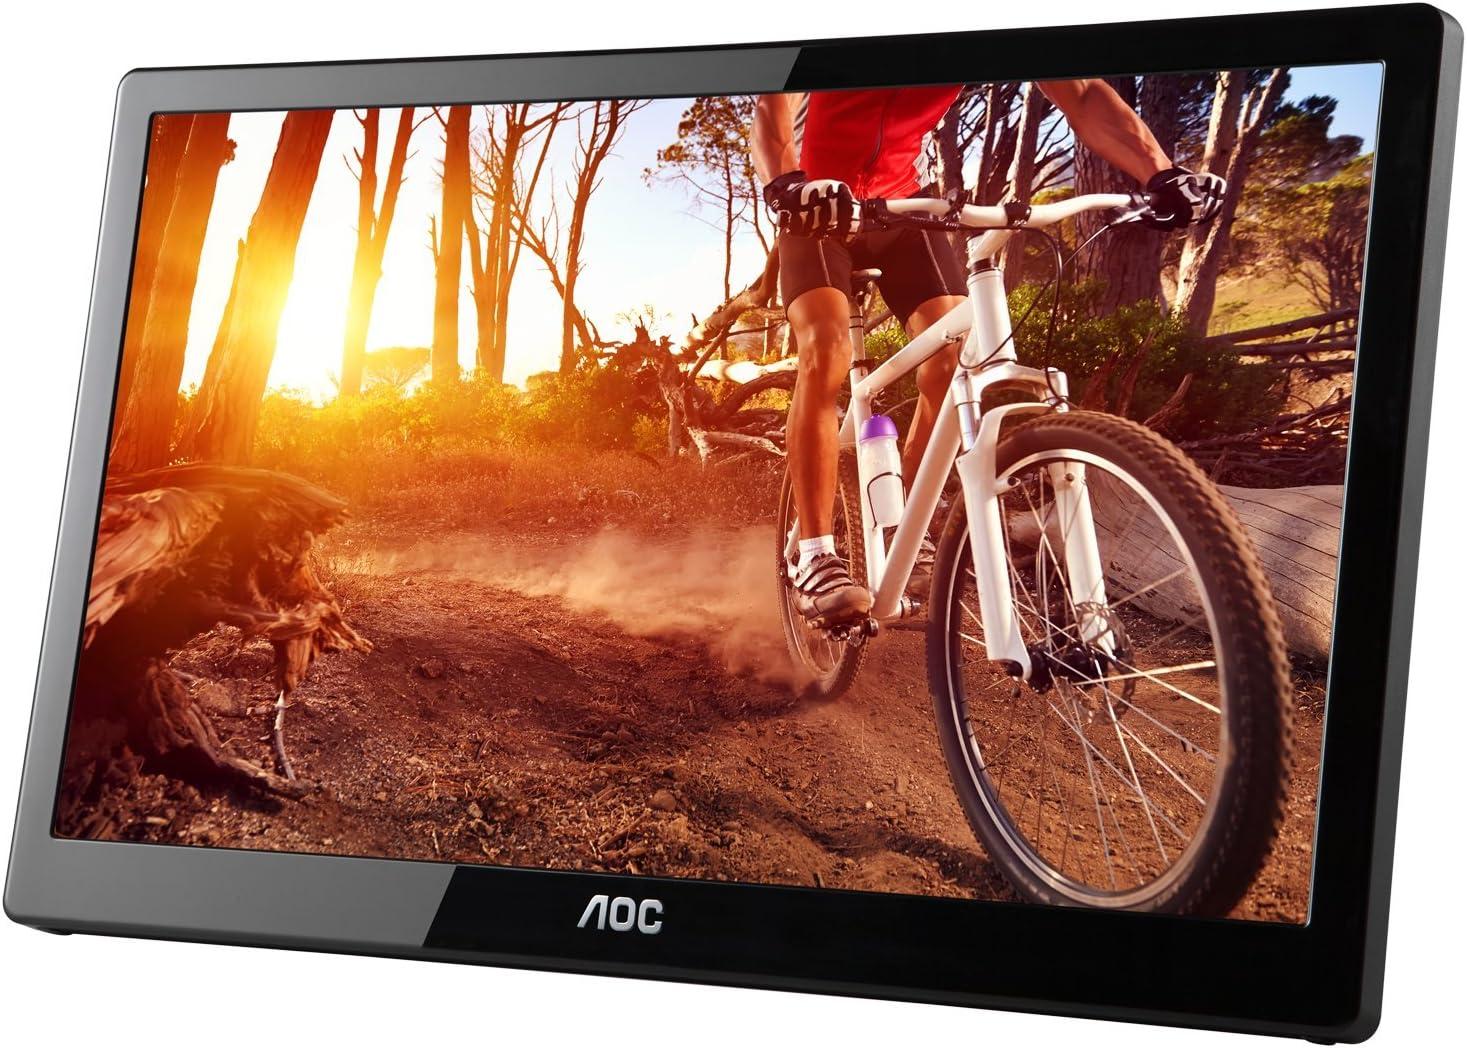 "Glos... 15.6/"" Widescreen Flat-Panel USB 3.0-Powered Portable LED Monitor AOC"